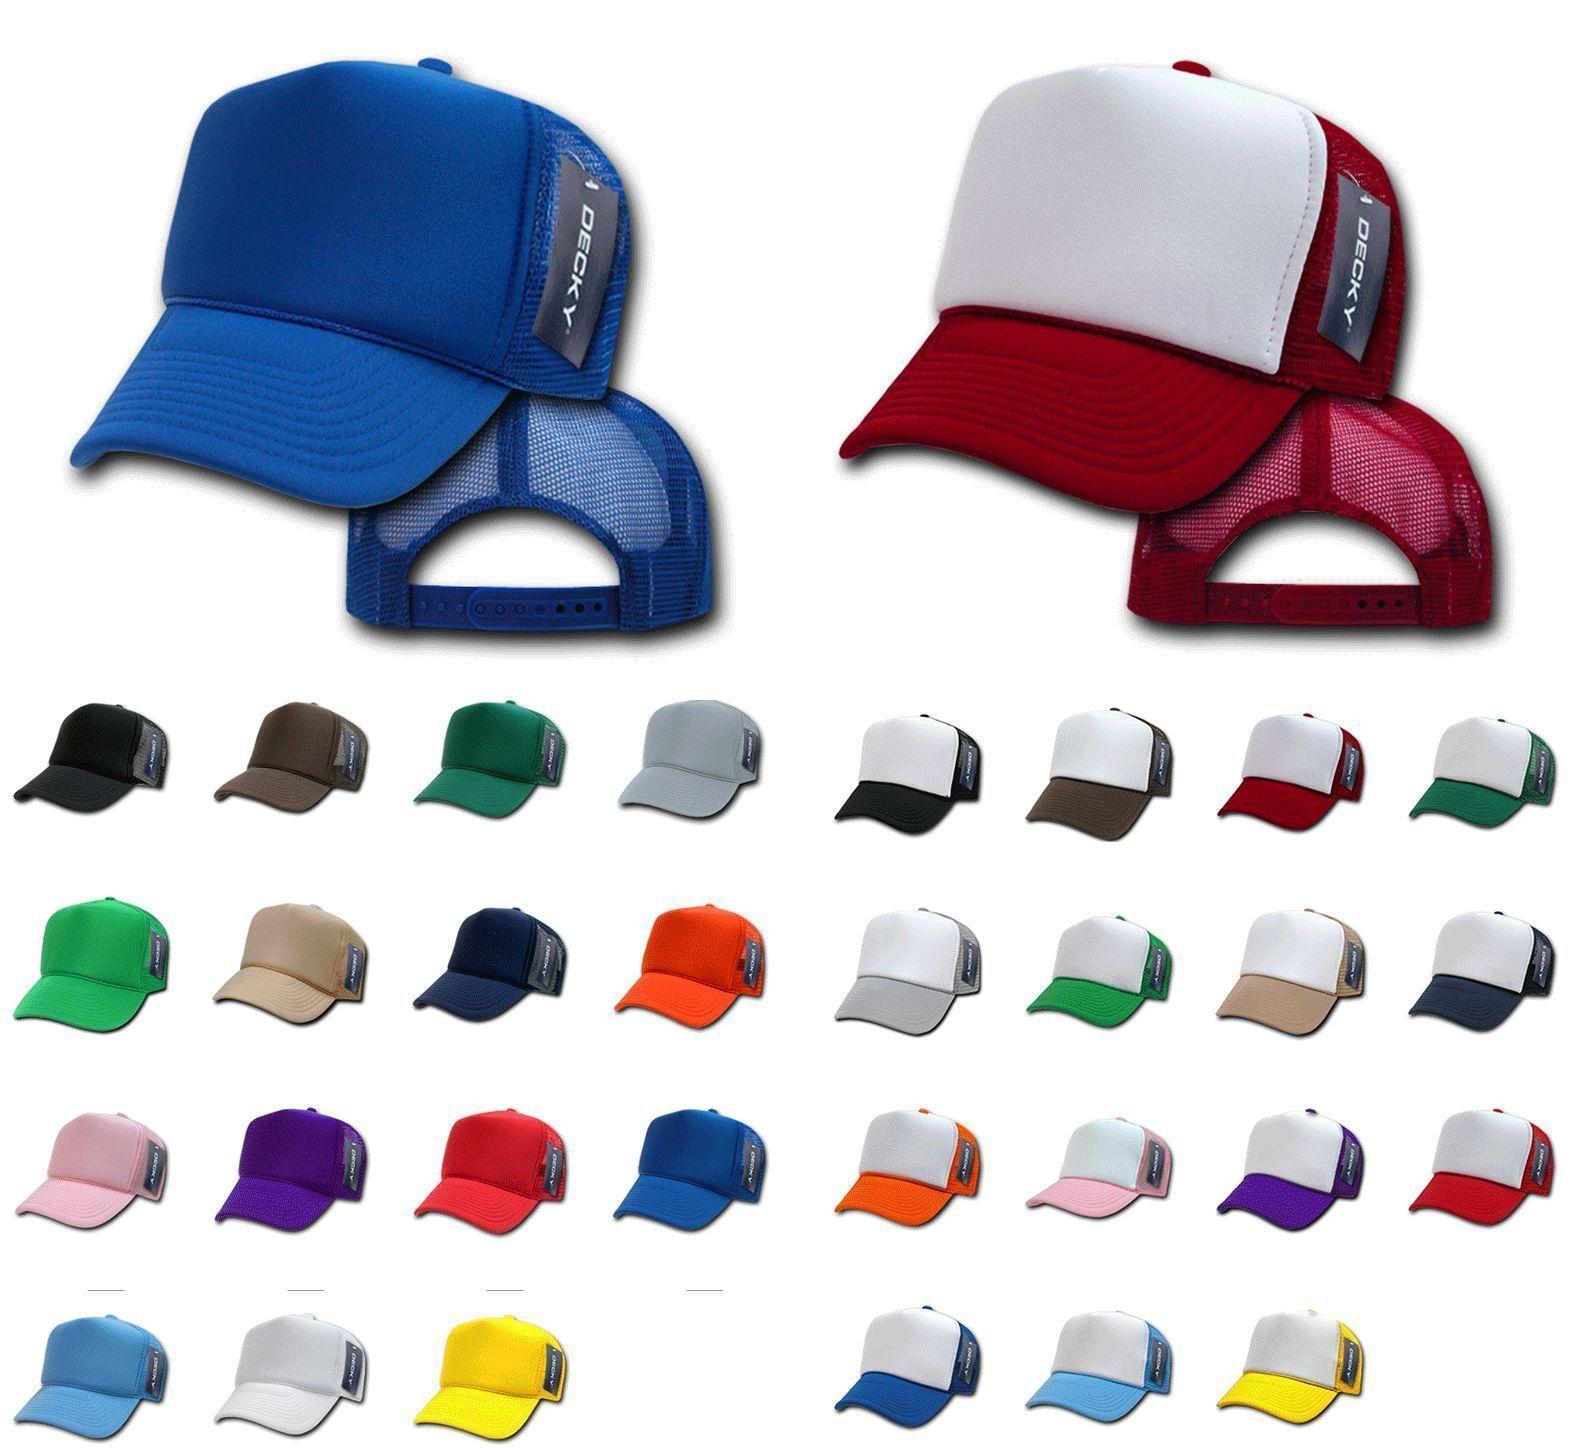 296ba3c818c 100 Decky Vintage New Trucker Hat Hats Cap Caps Snapback Wholesale Bulk Lot